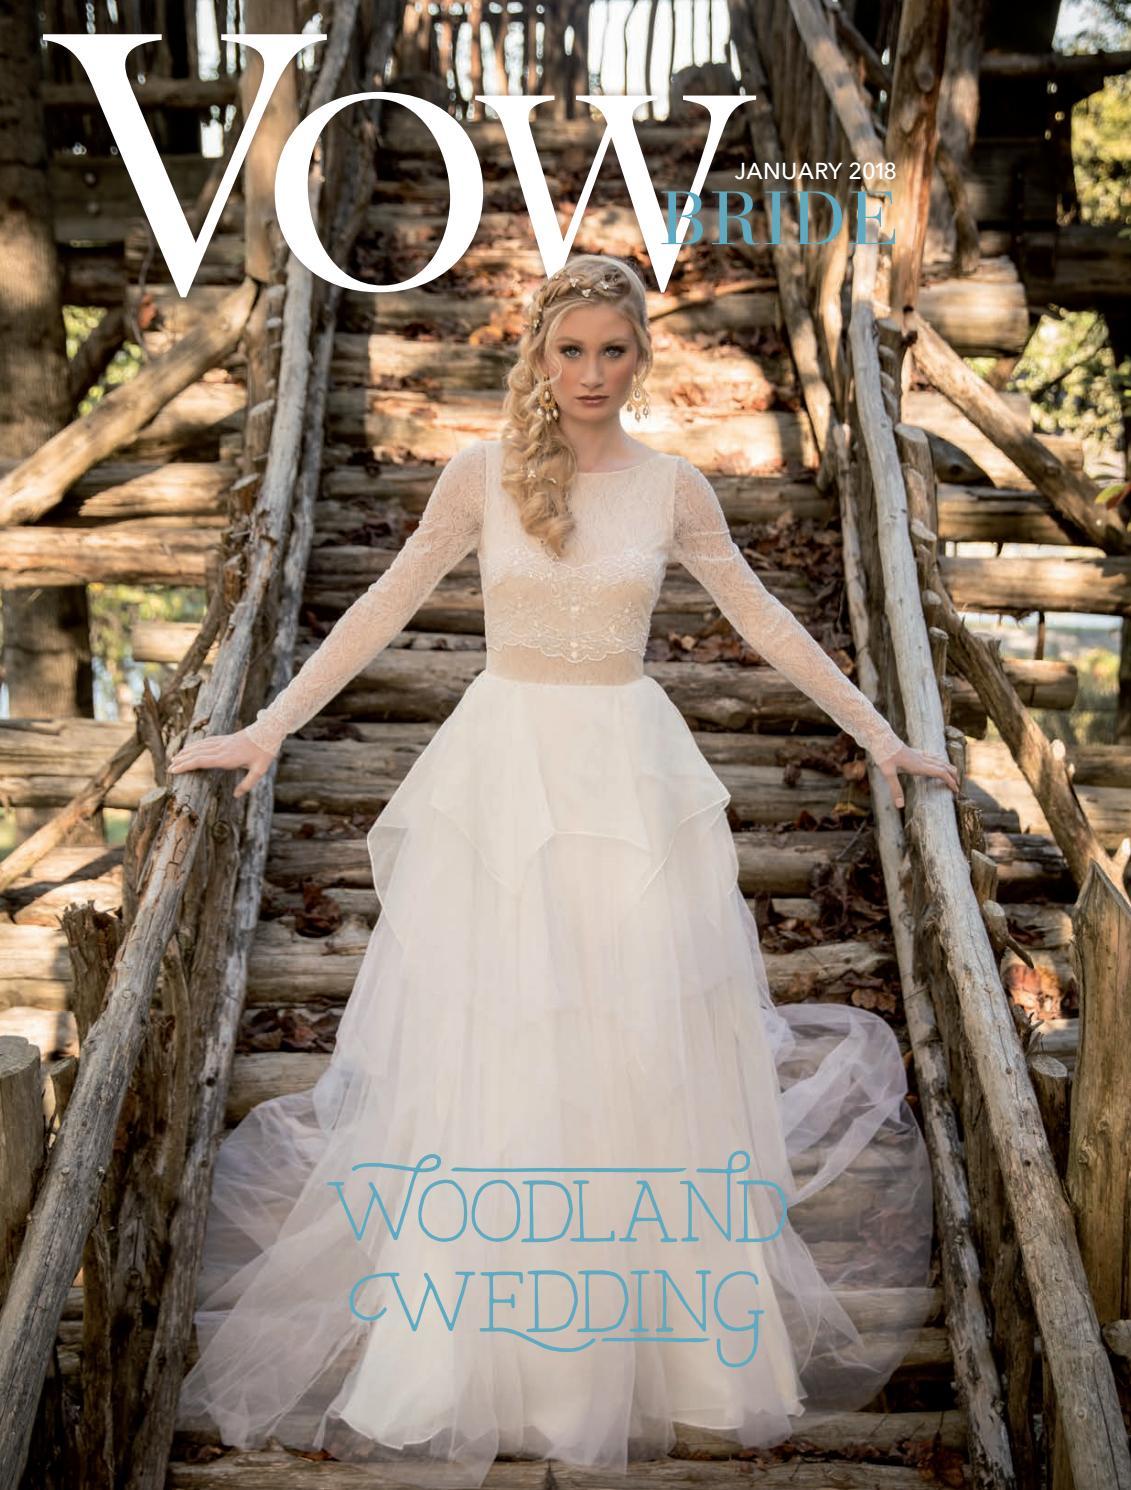 VOW Bride Spring/Summer 2018 by Vow Bride - issuu